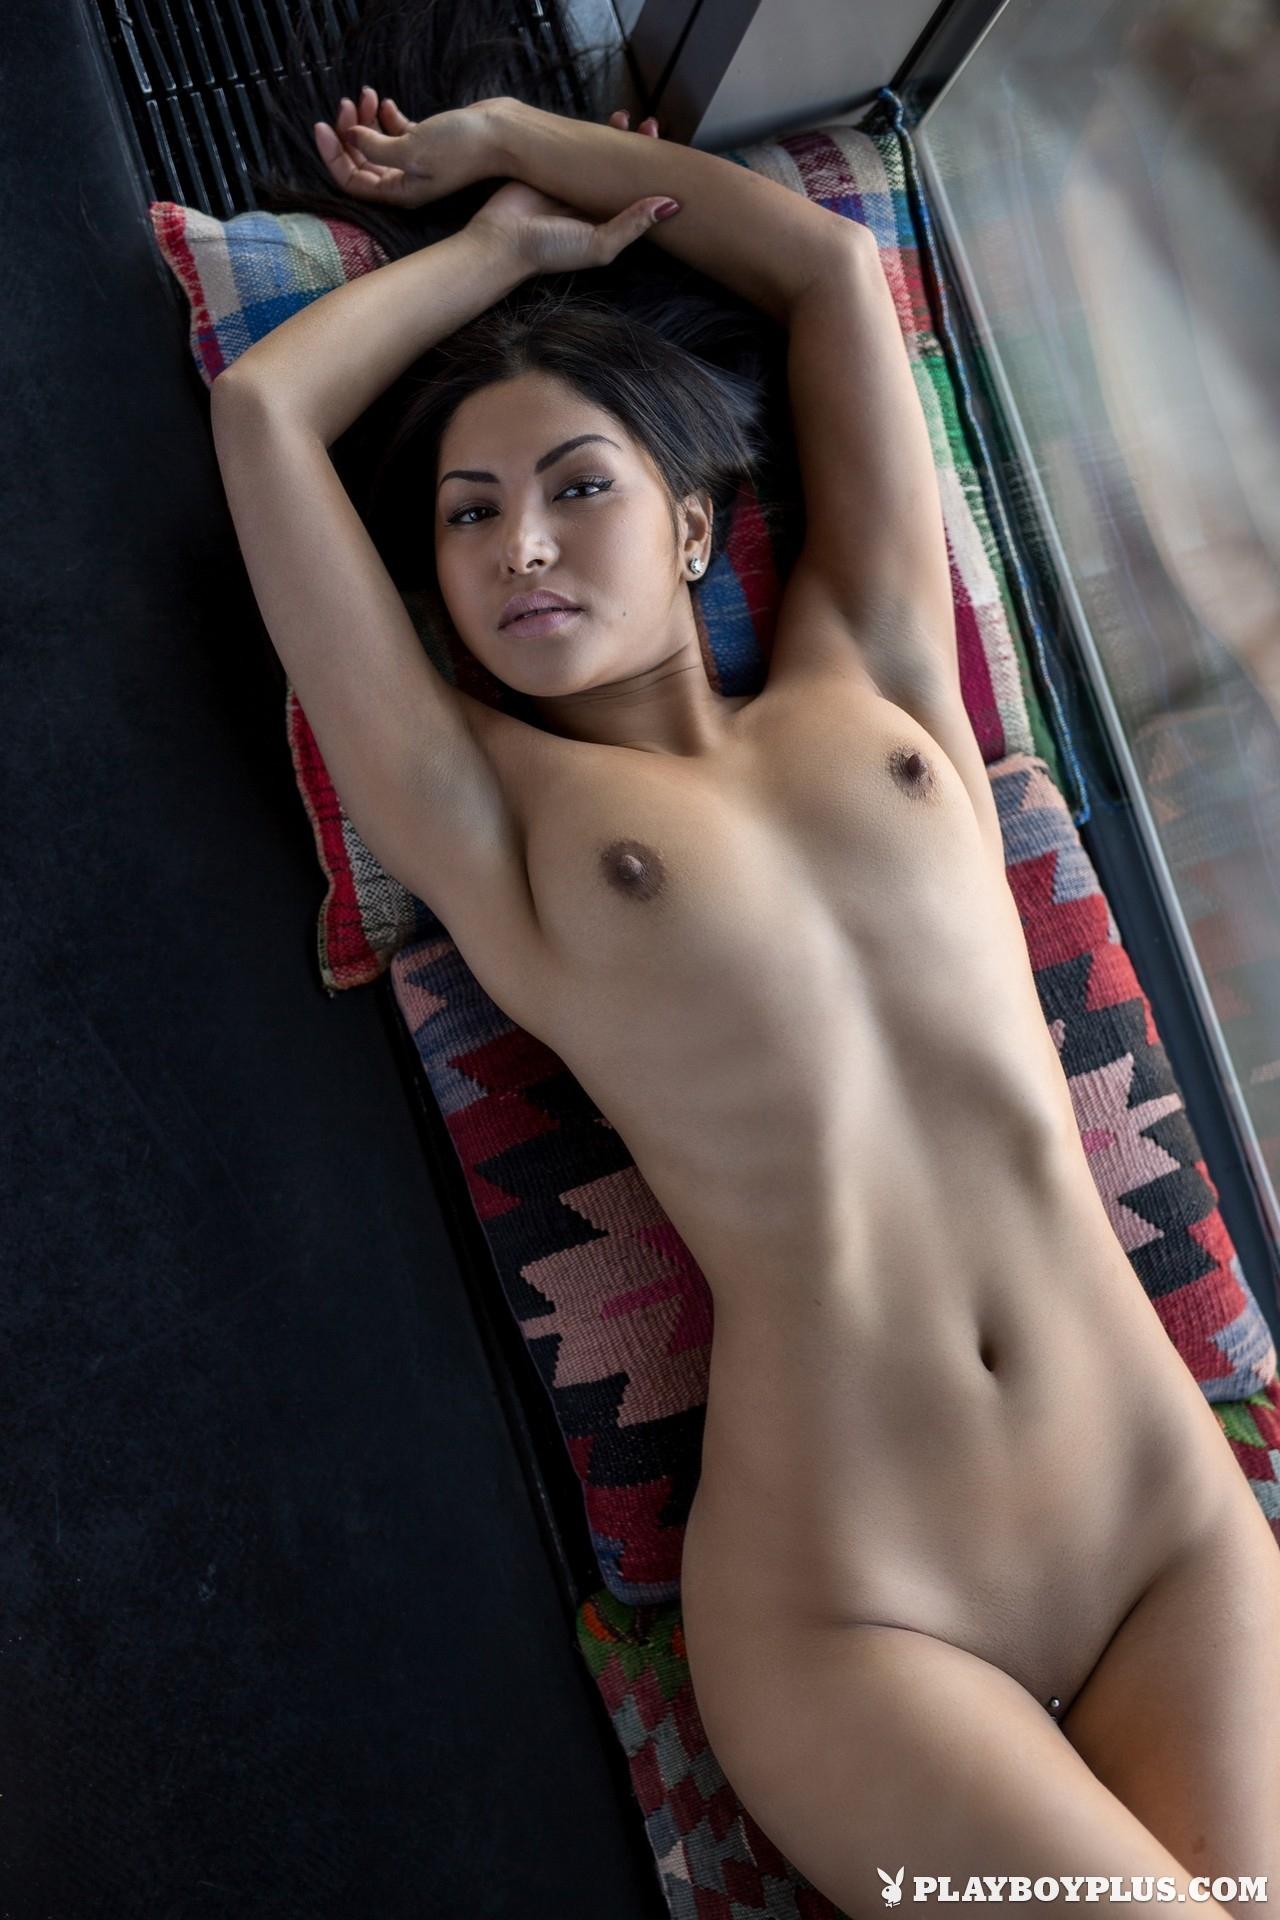 Playboy Plus Chloe Rose In Inspiring View (20)